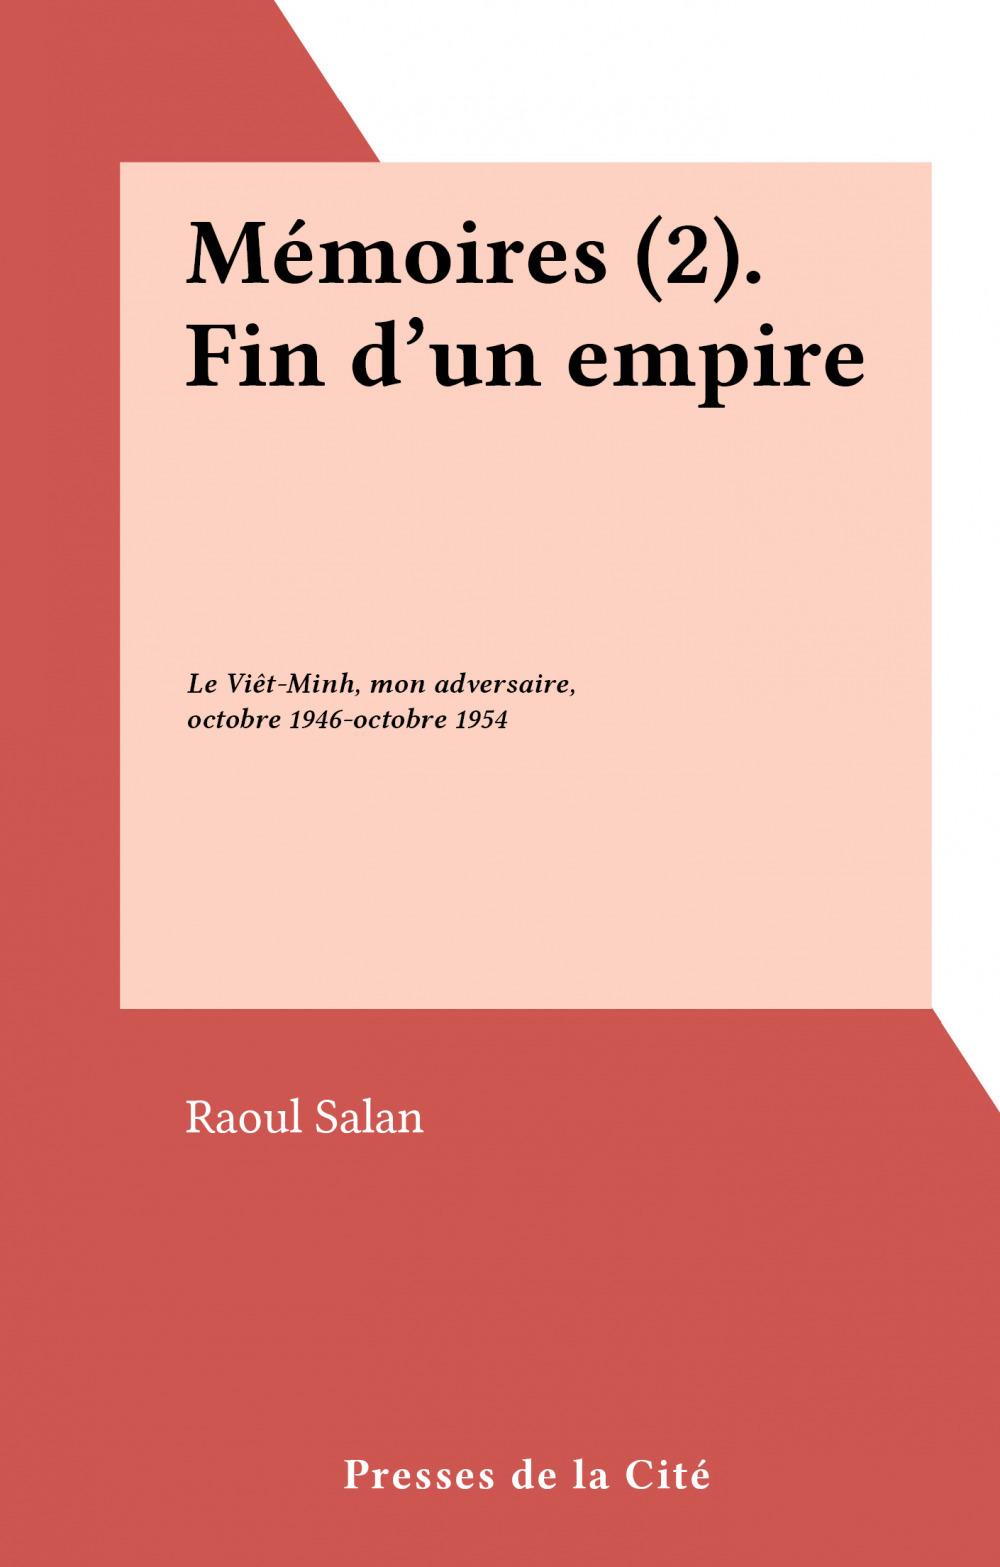 Mémoires (2). Fin d'un empire  - Raoul Salan